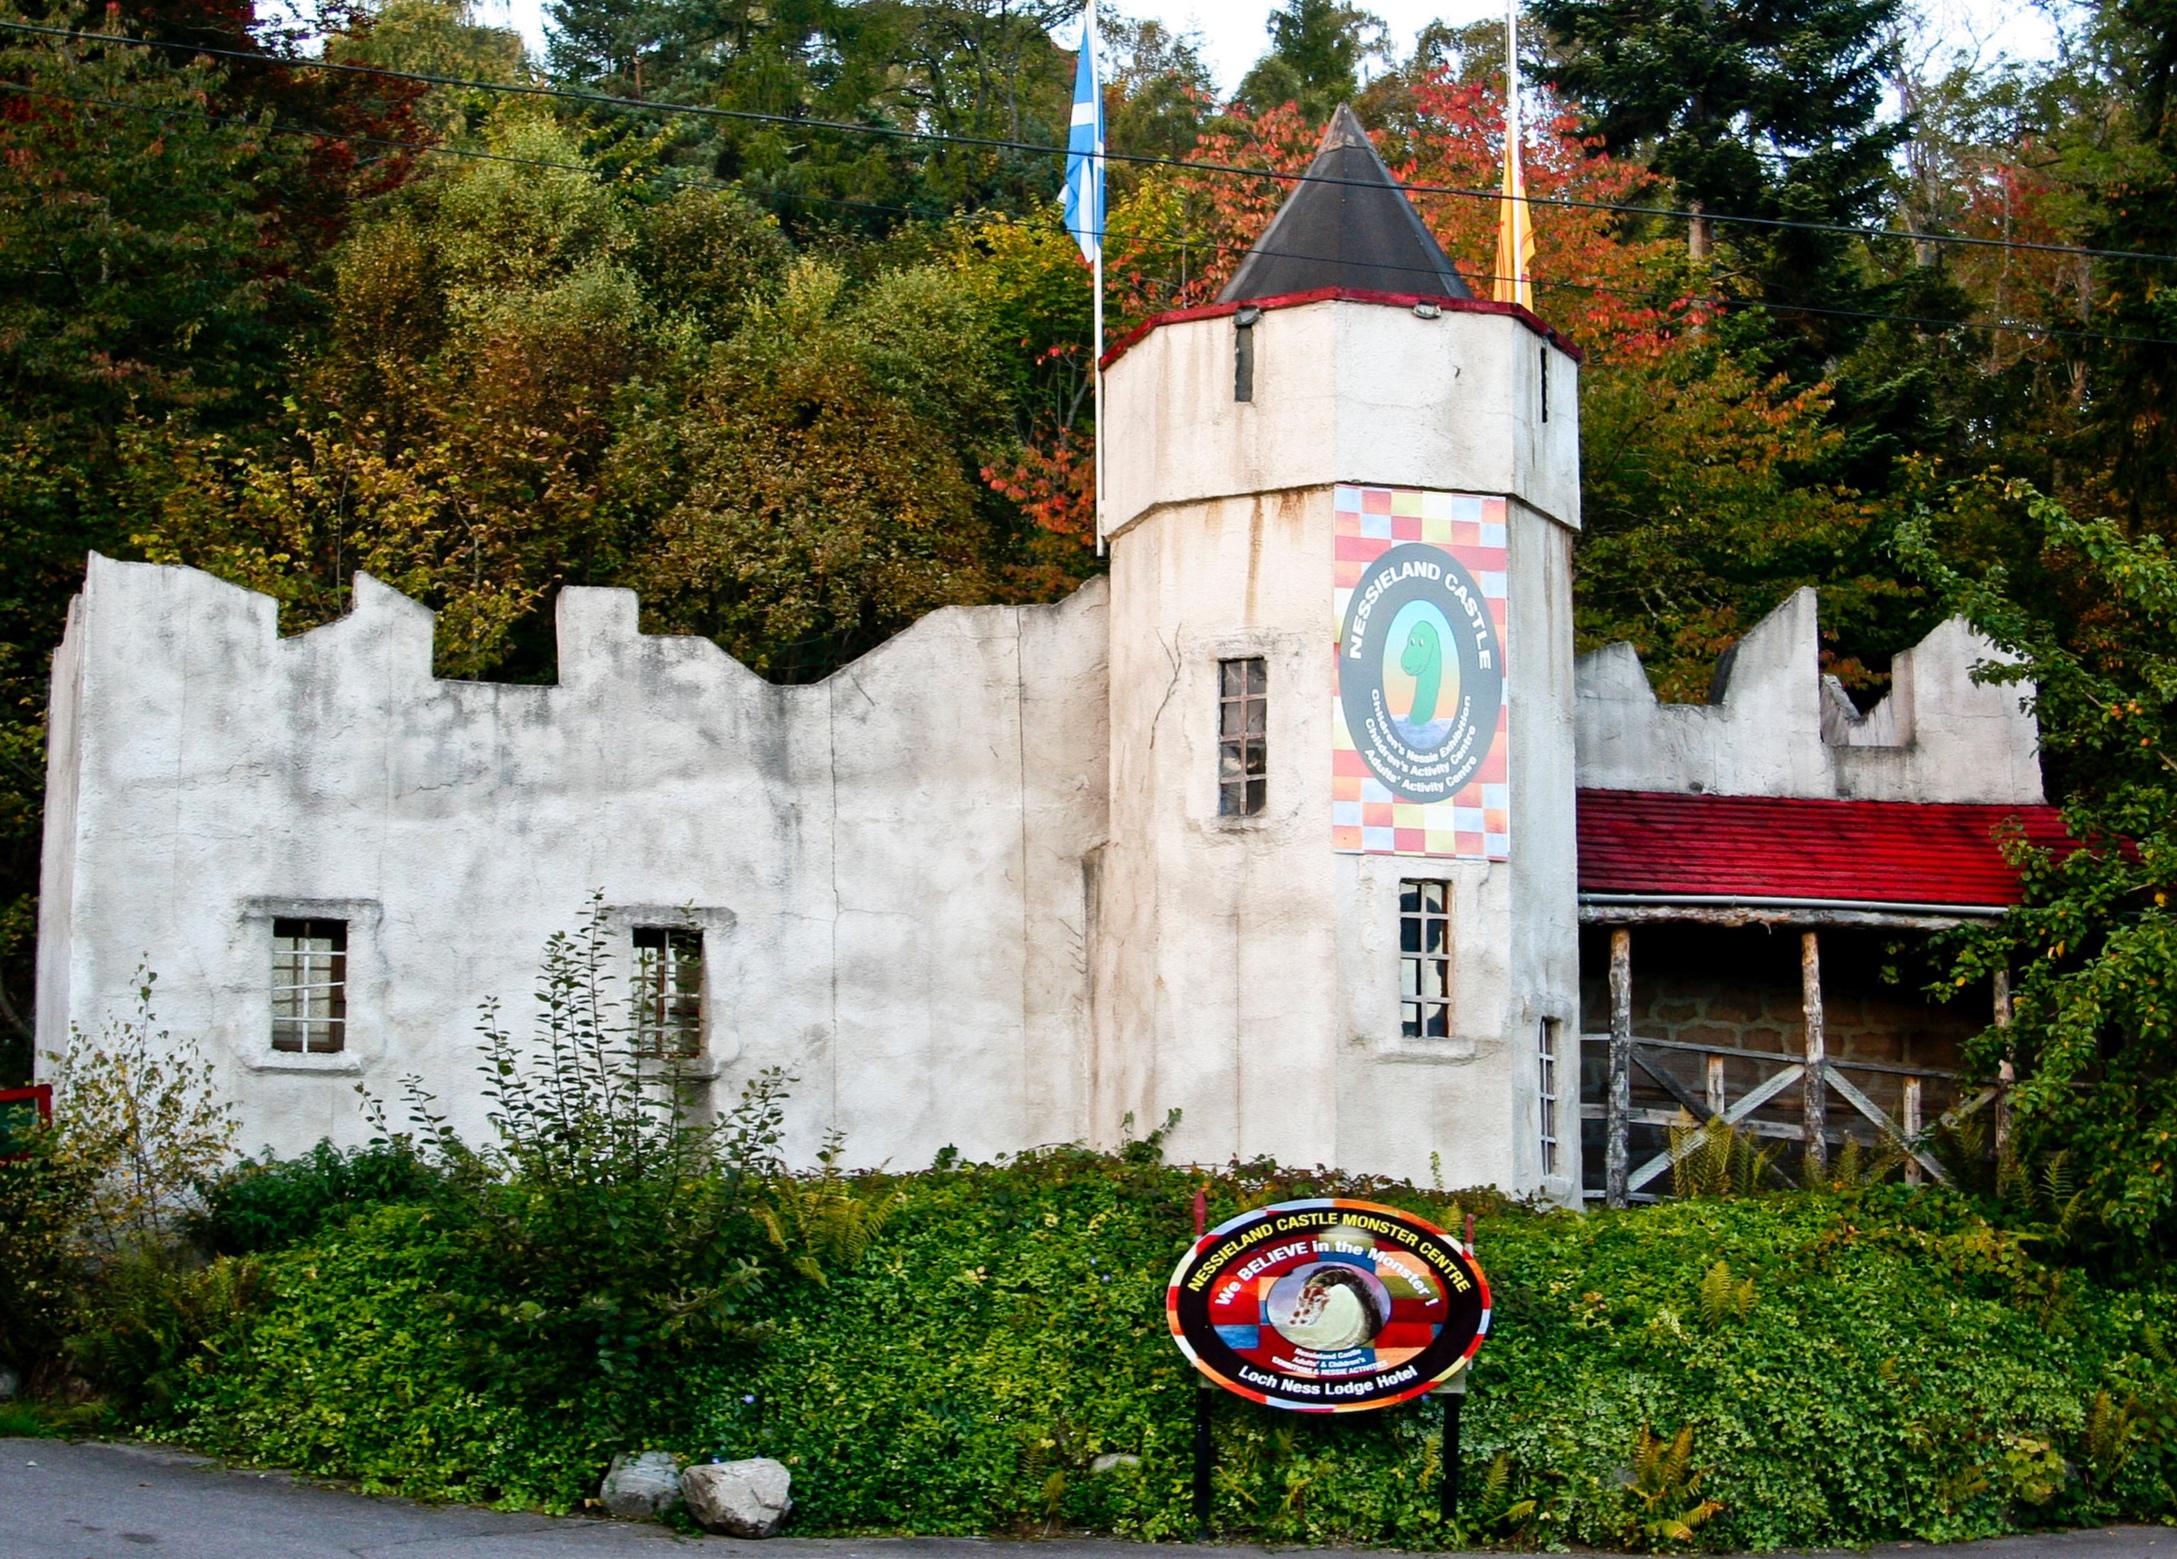 Nessieland Castle